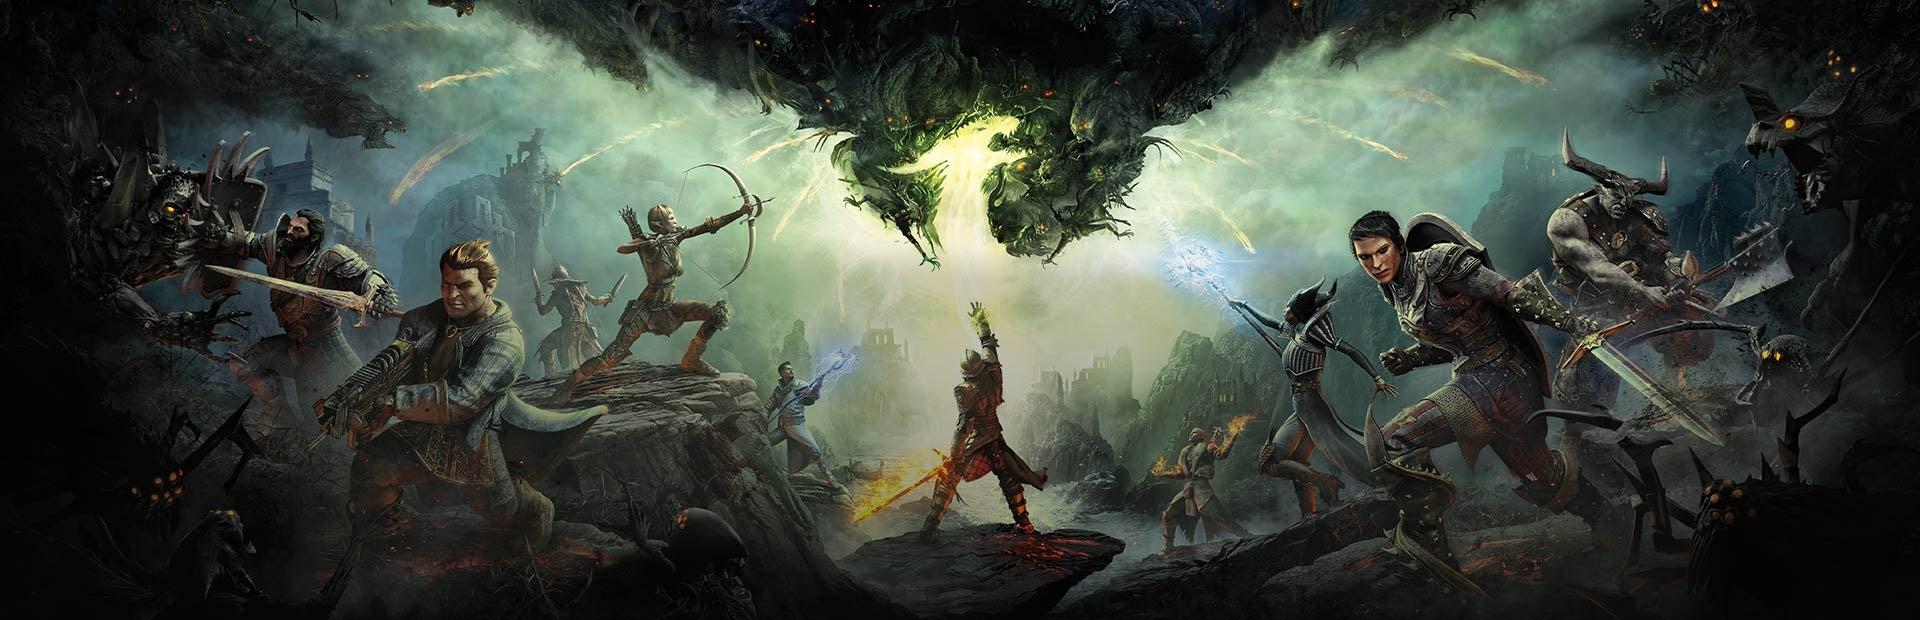 Dragon Age: Inquisition Has A Filler Problem